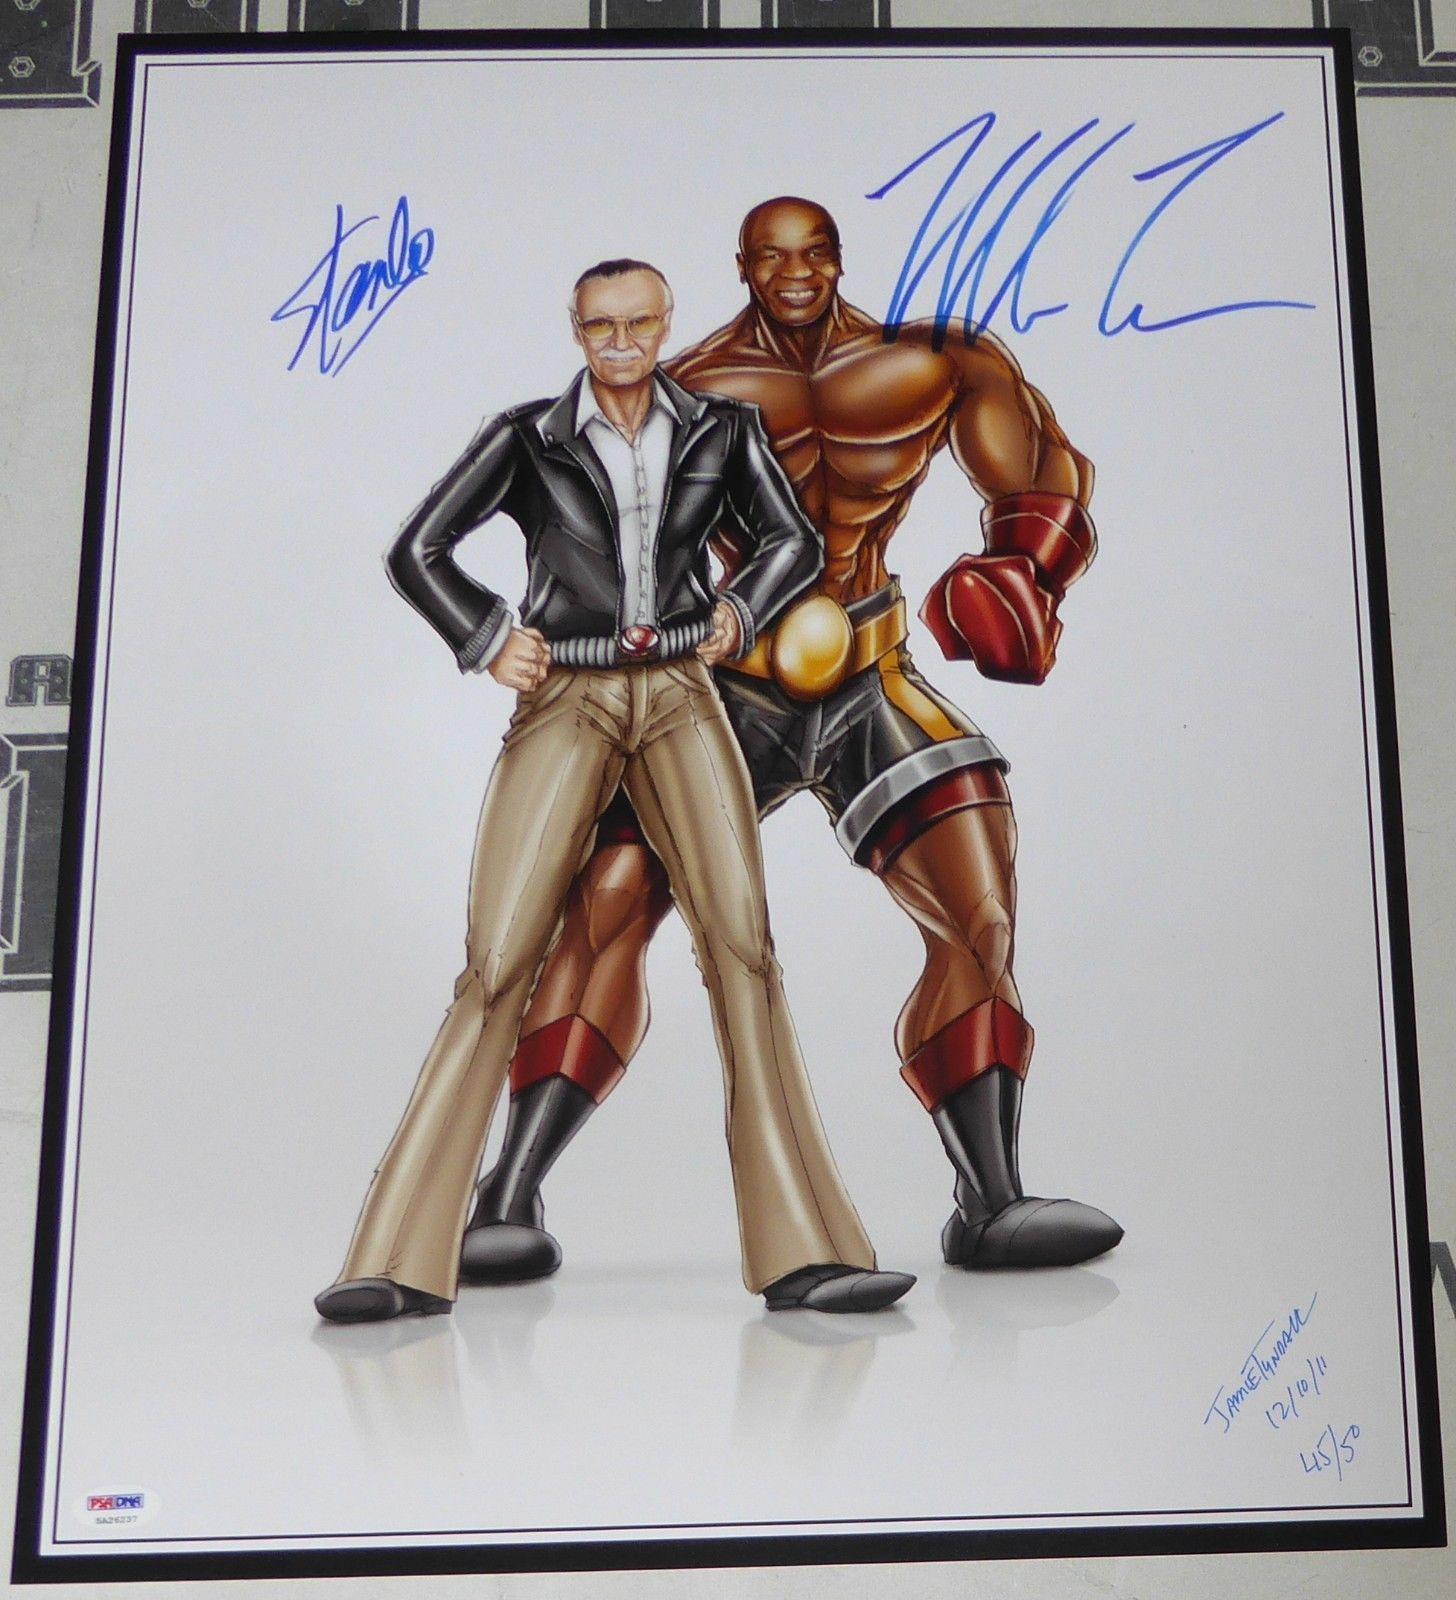 Signed Tyson Photograph - & Stan Lee 16x20 PSA DNA COA Limited Edition 'd #/50